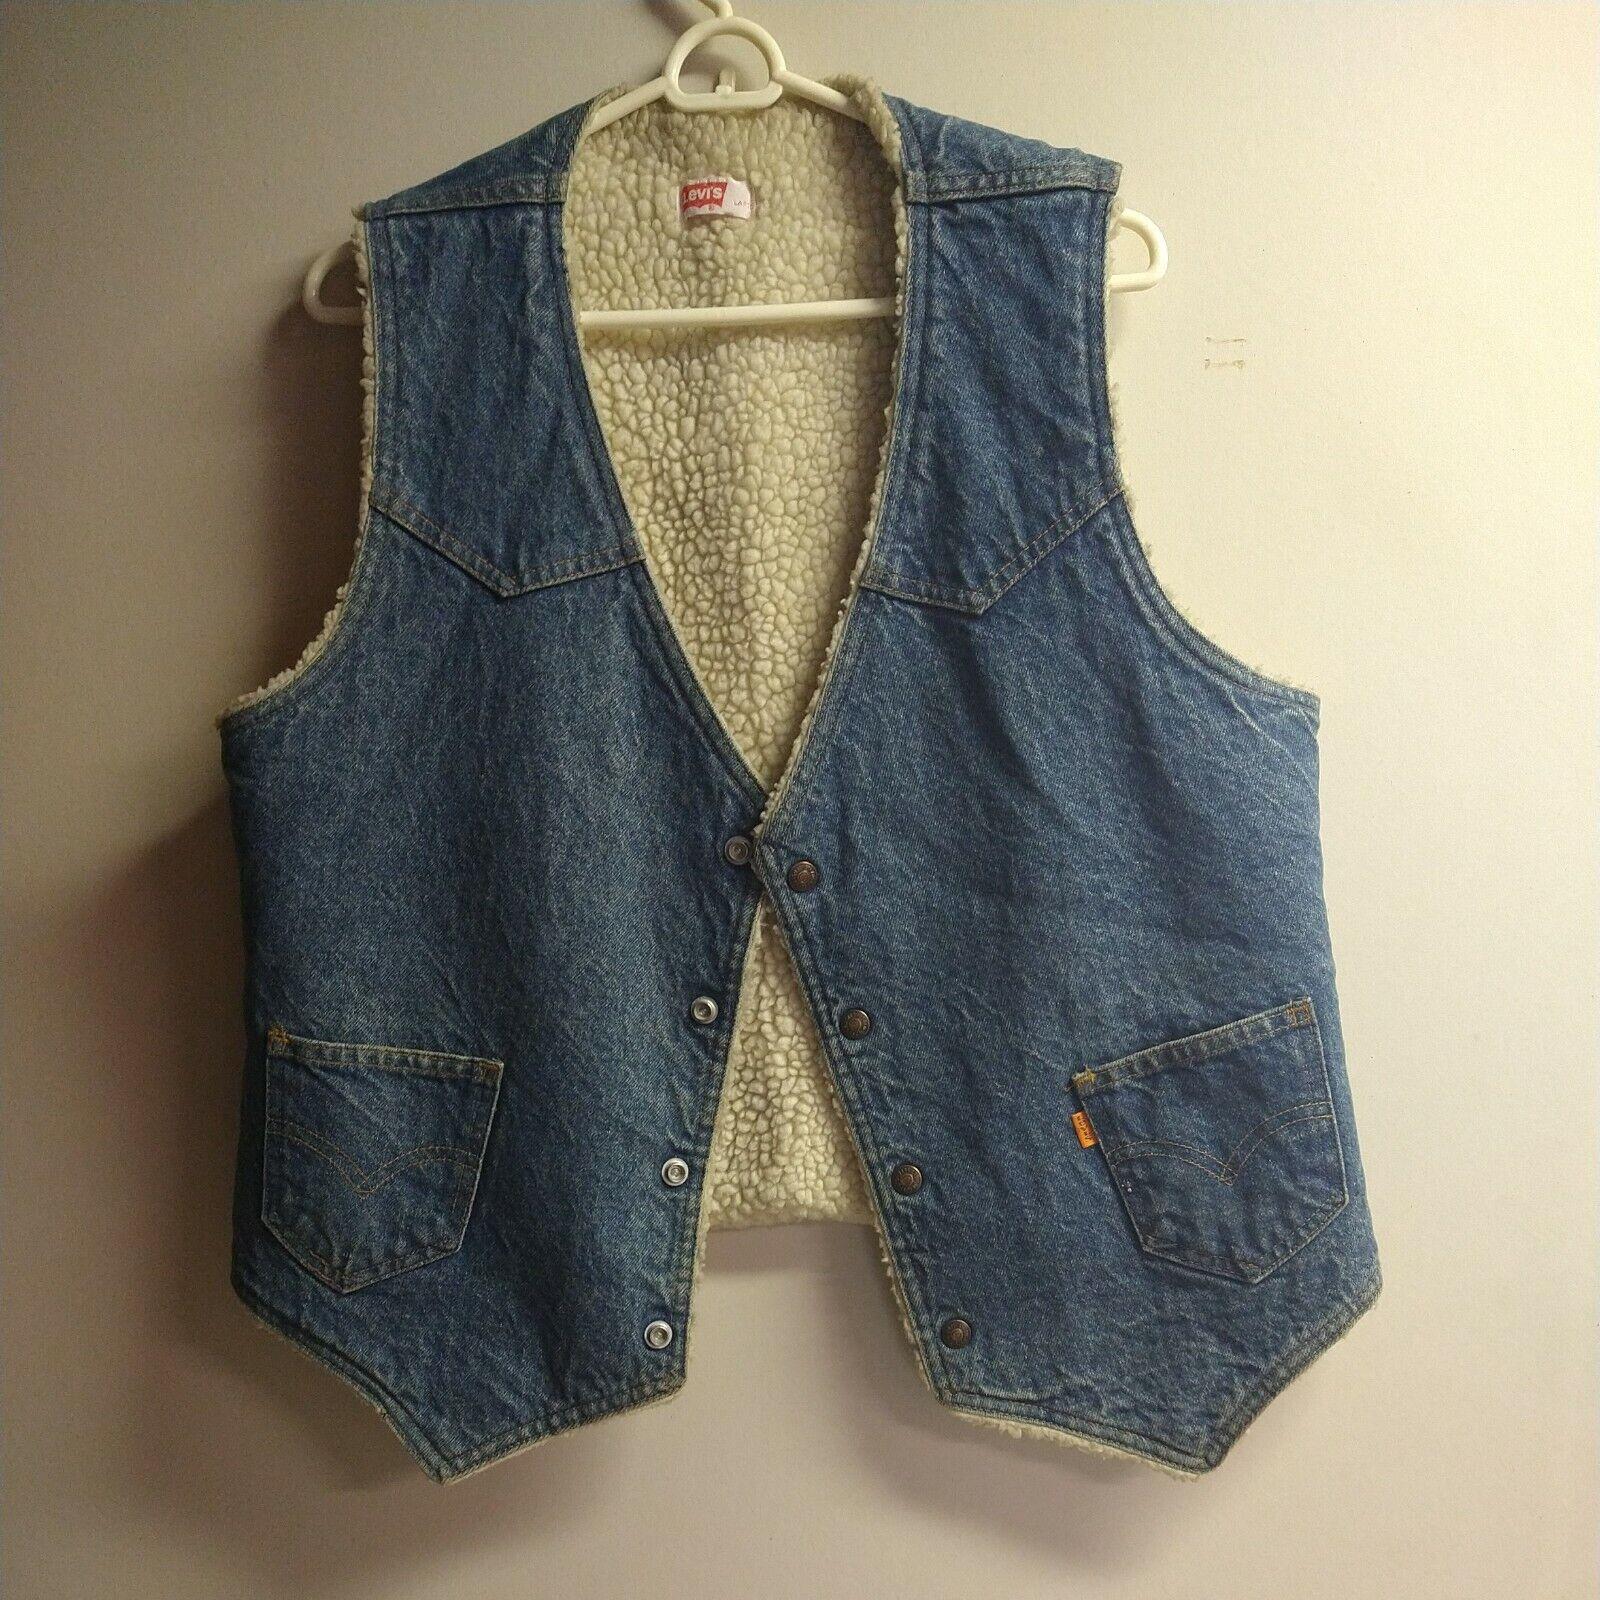 Levis vintage clothing Vest made in USA - image 1